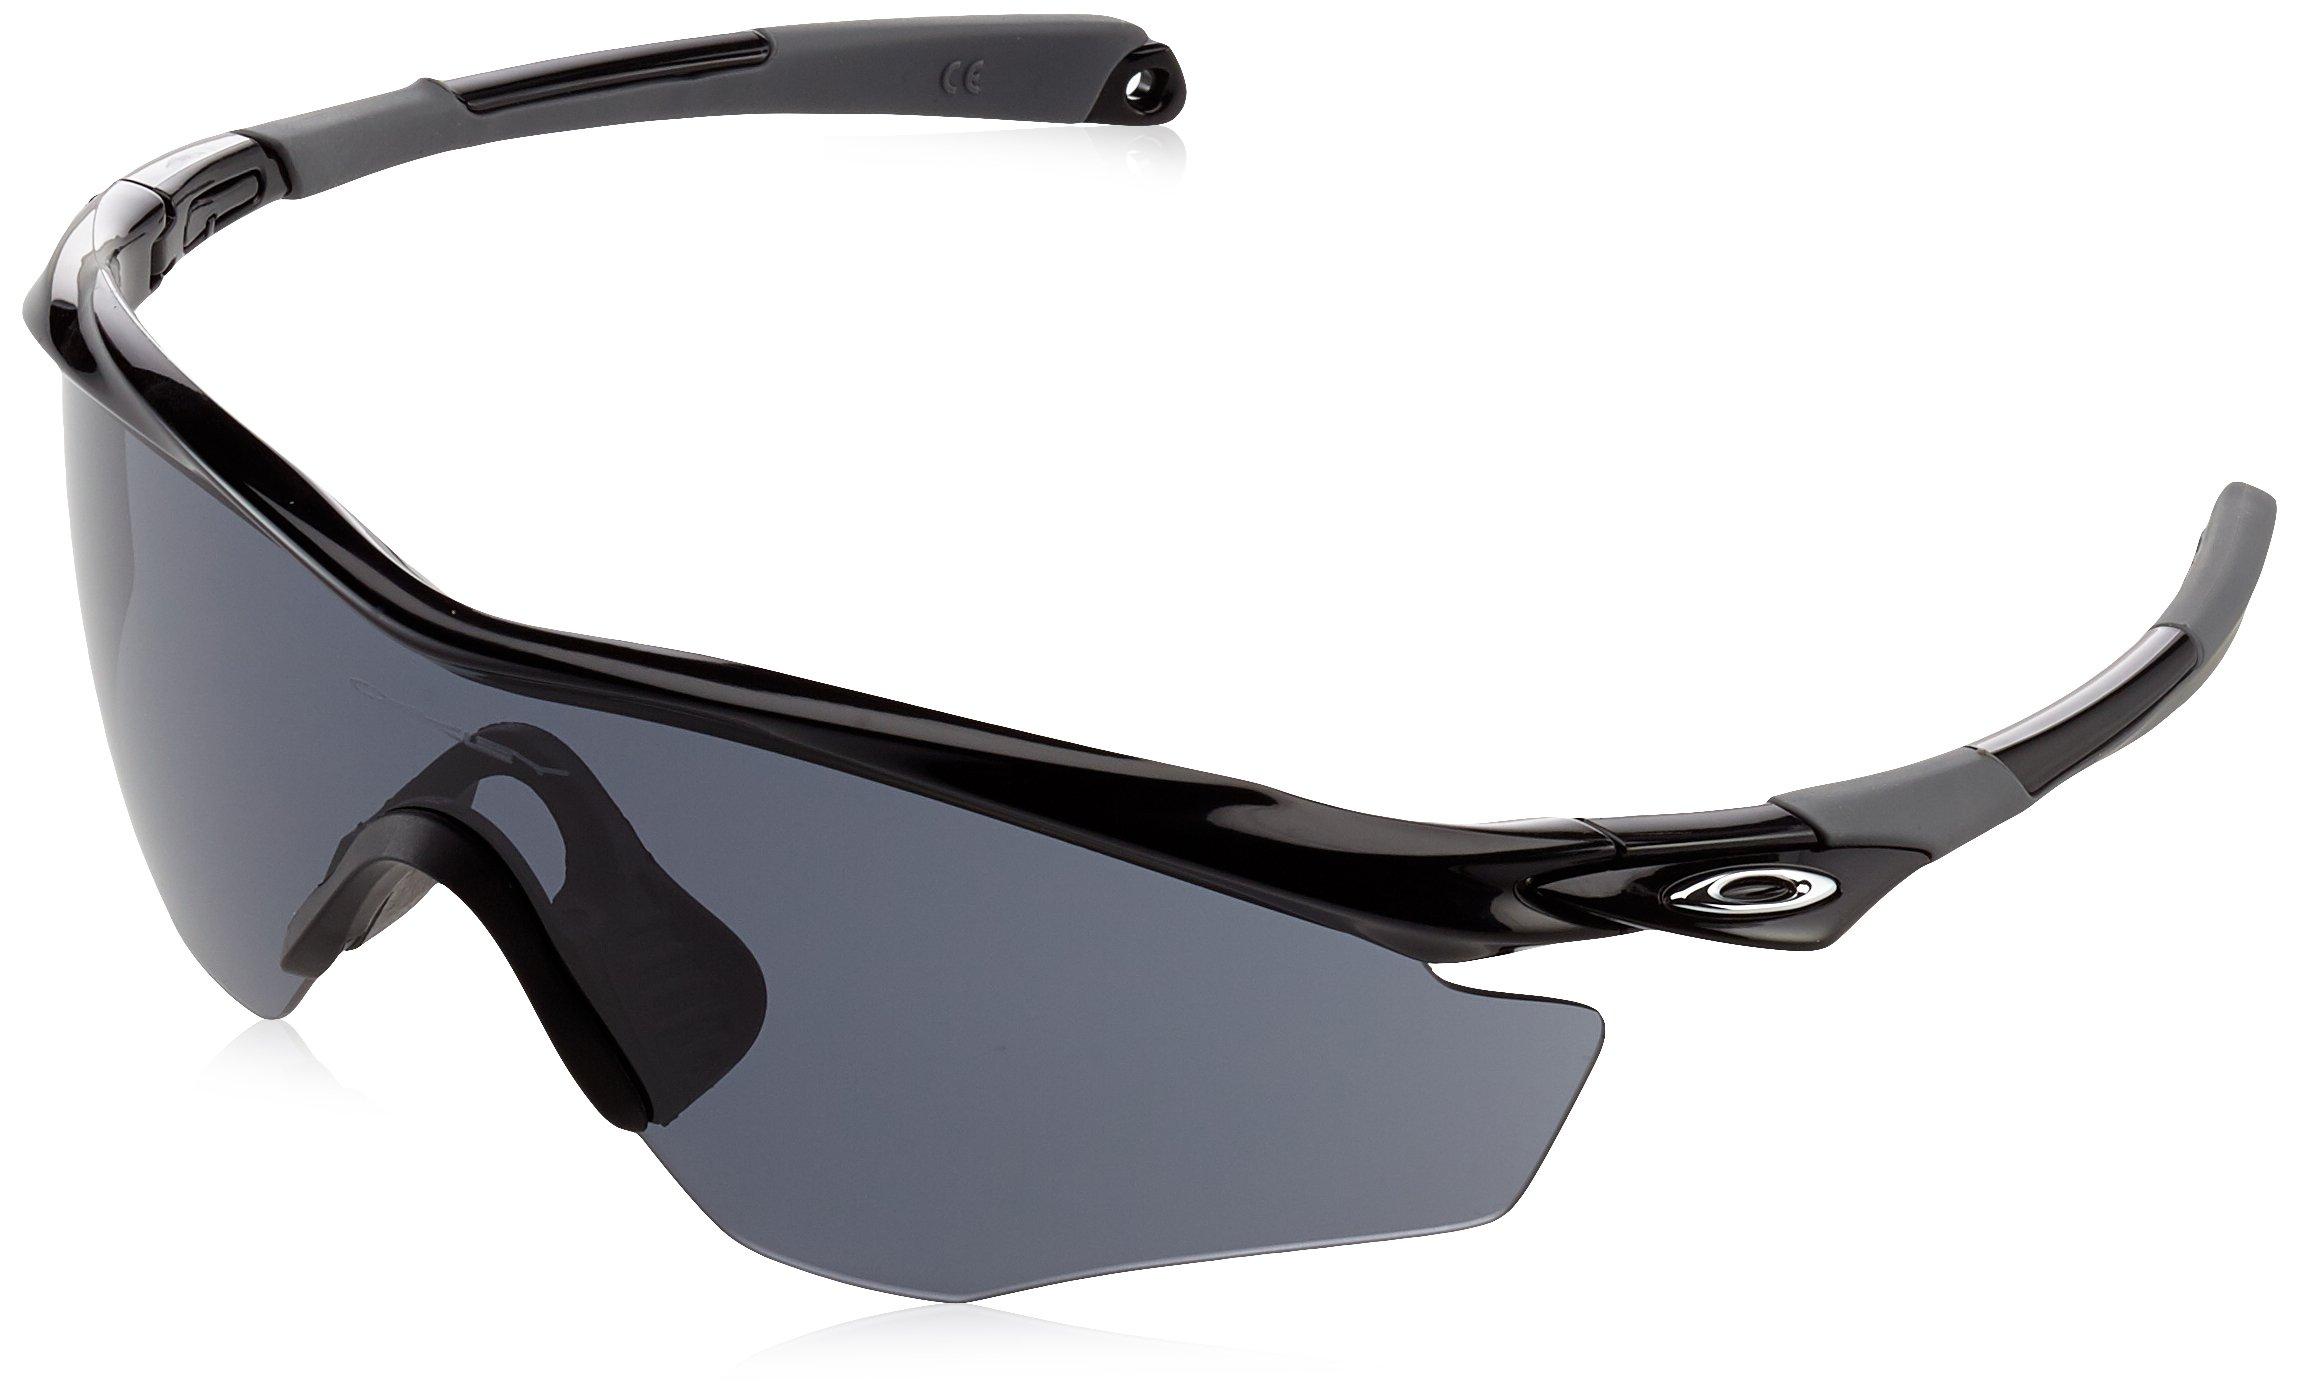 Oakley Men's OO9343 M2 Frame XL Shield Sunglasses, Polished Black/Grey, 45 mm